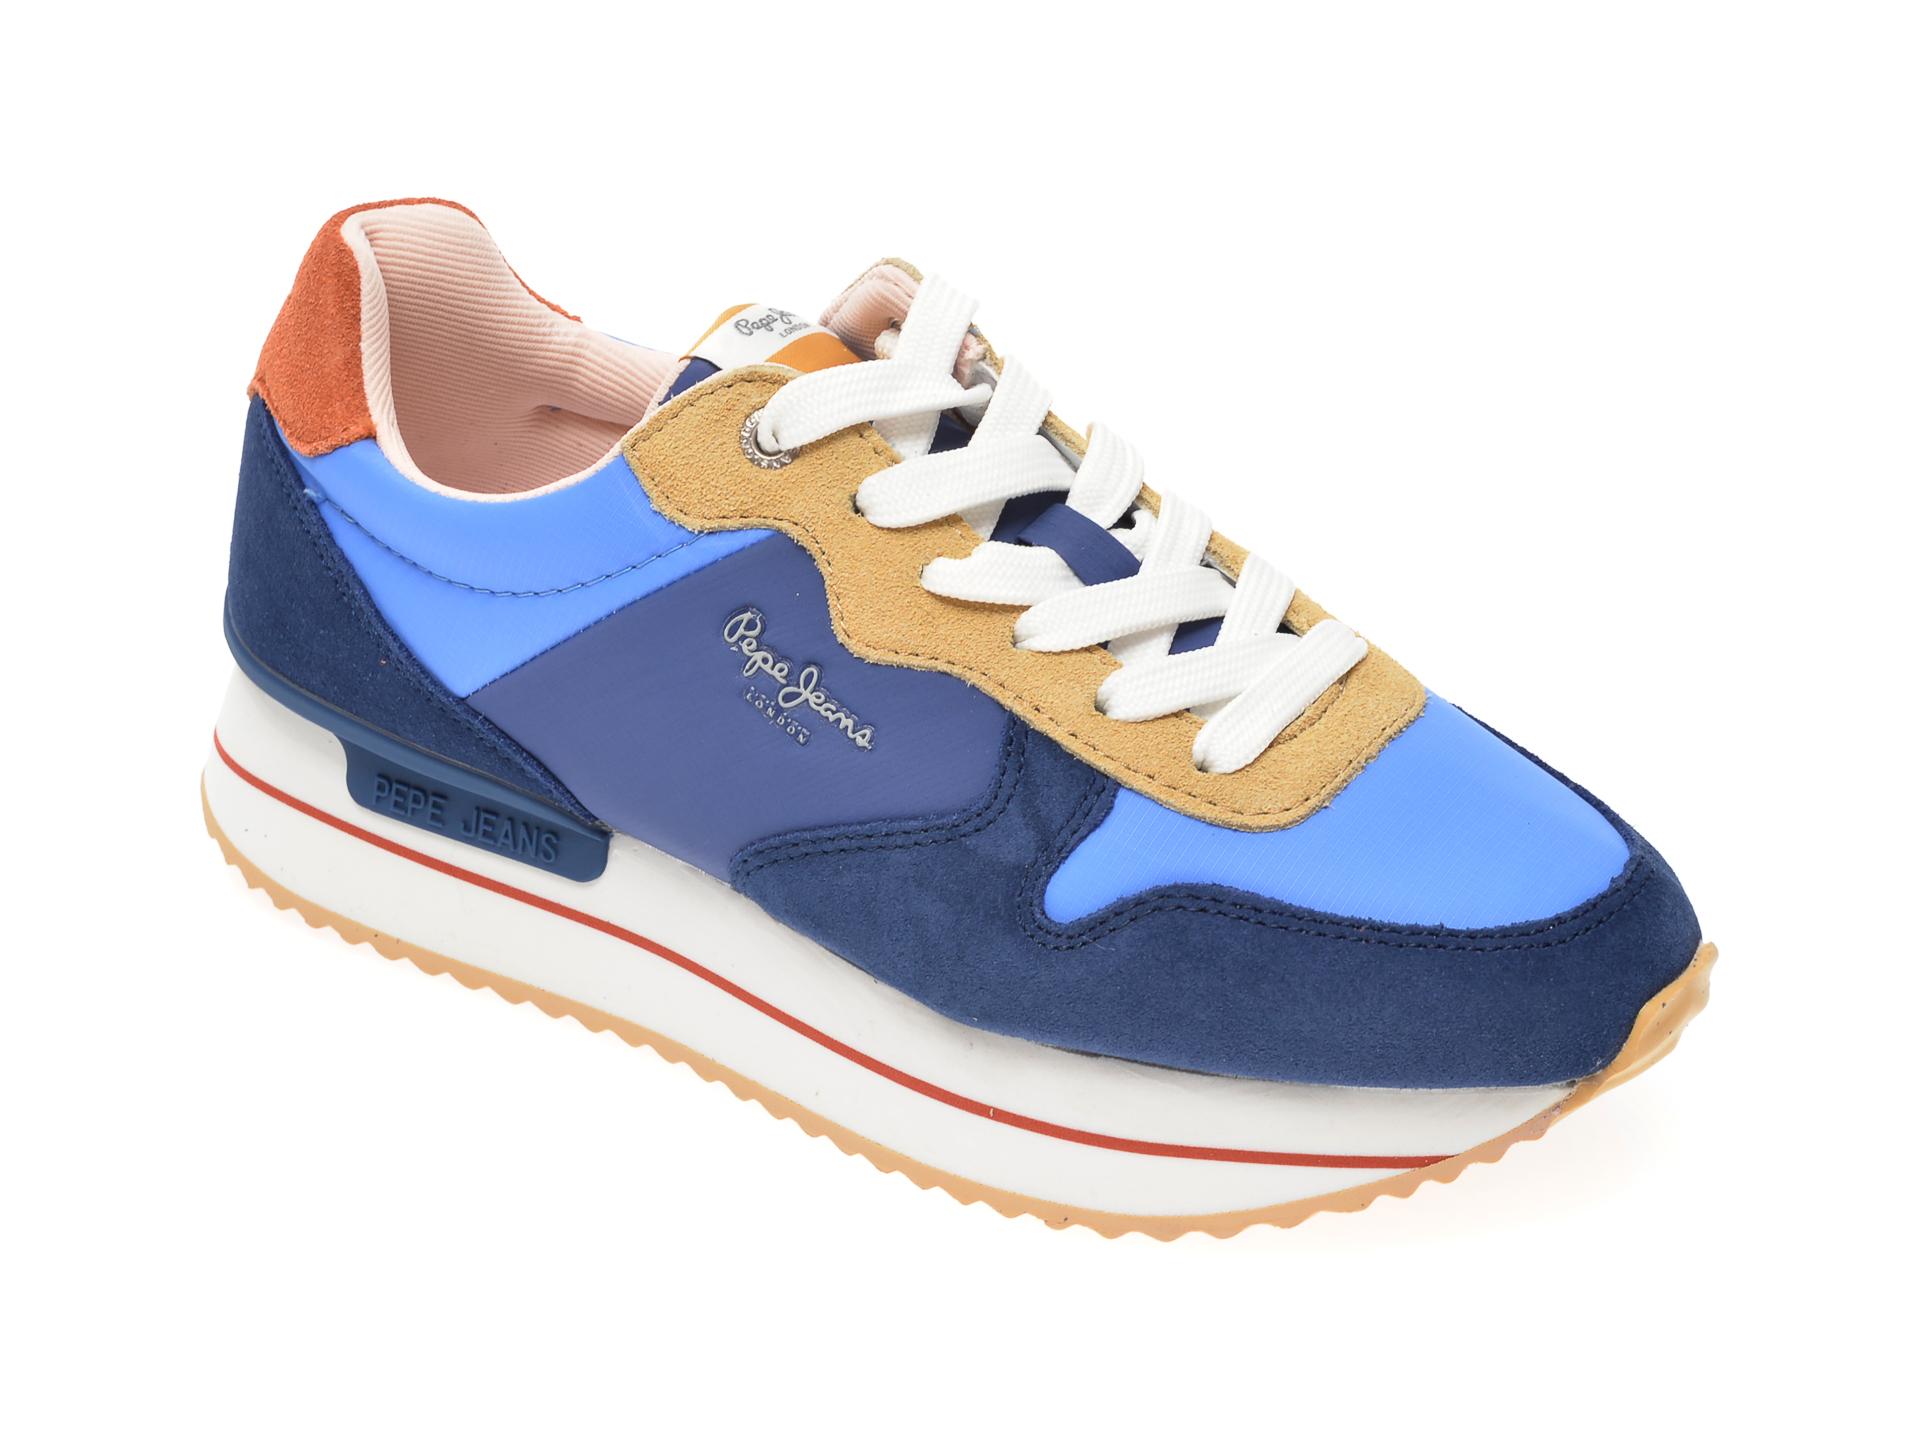 Pantofi sport PEPE JEANS albastri, LS30991, din material textil si piele intoarsa